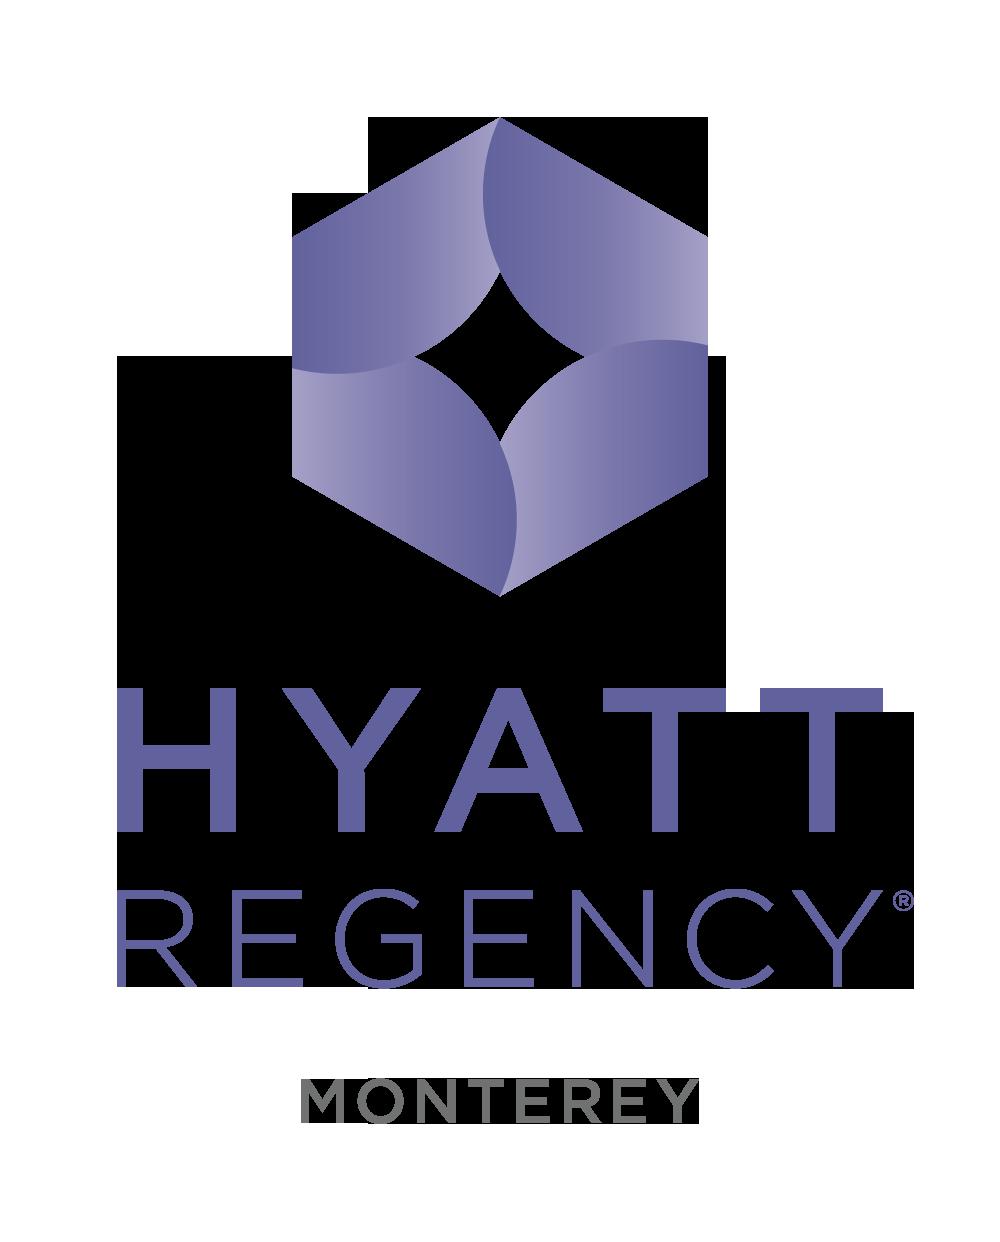 Hyatt Regency Monterey Hotel and Spa on Del Monte Golf Course logo